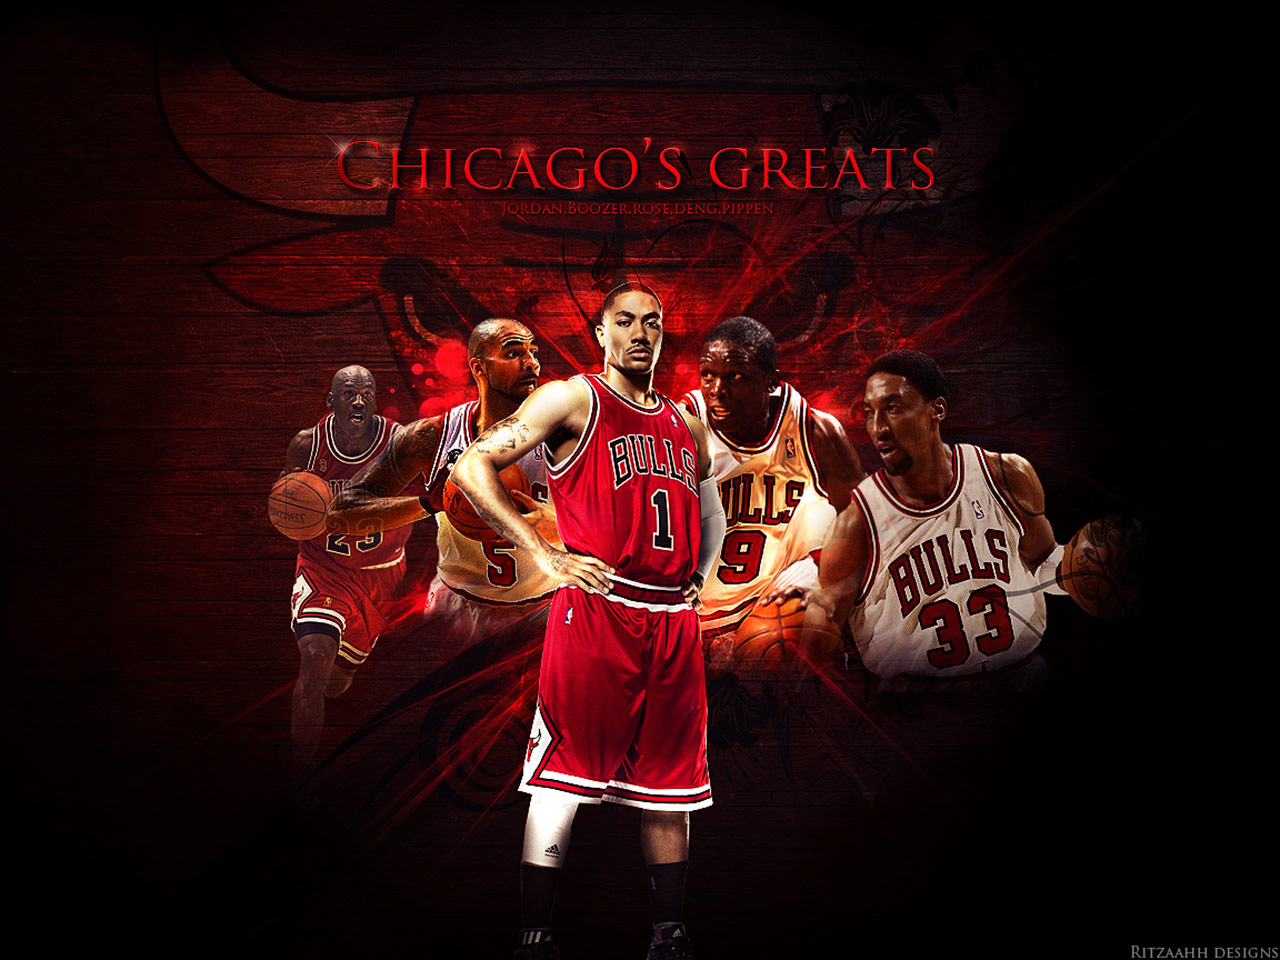 Chicago bulls greats wallpaper free desktop wallpapers for chicago bulls greats wallpaper voltagebd Image collections